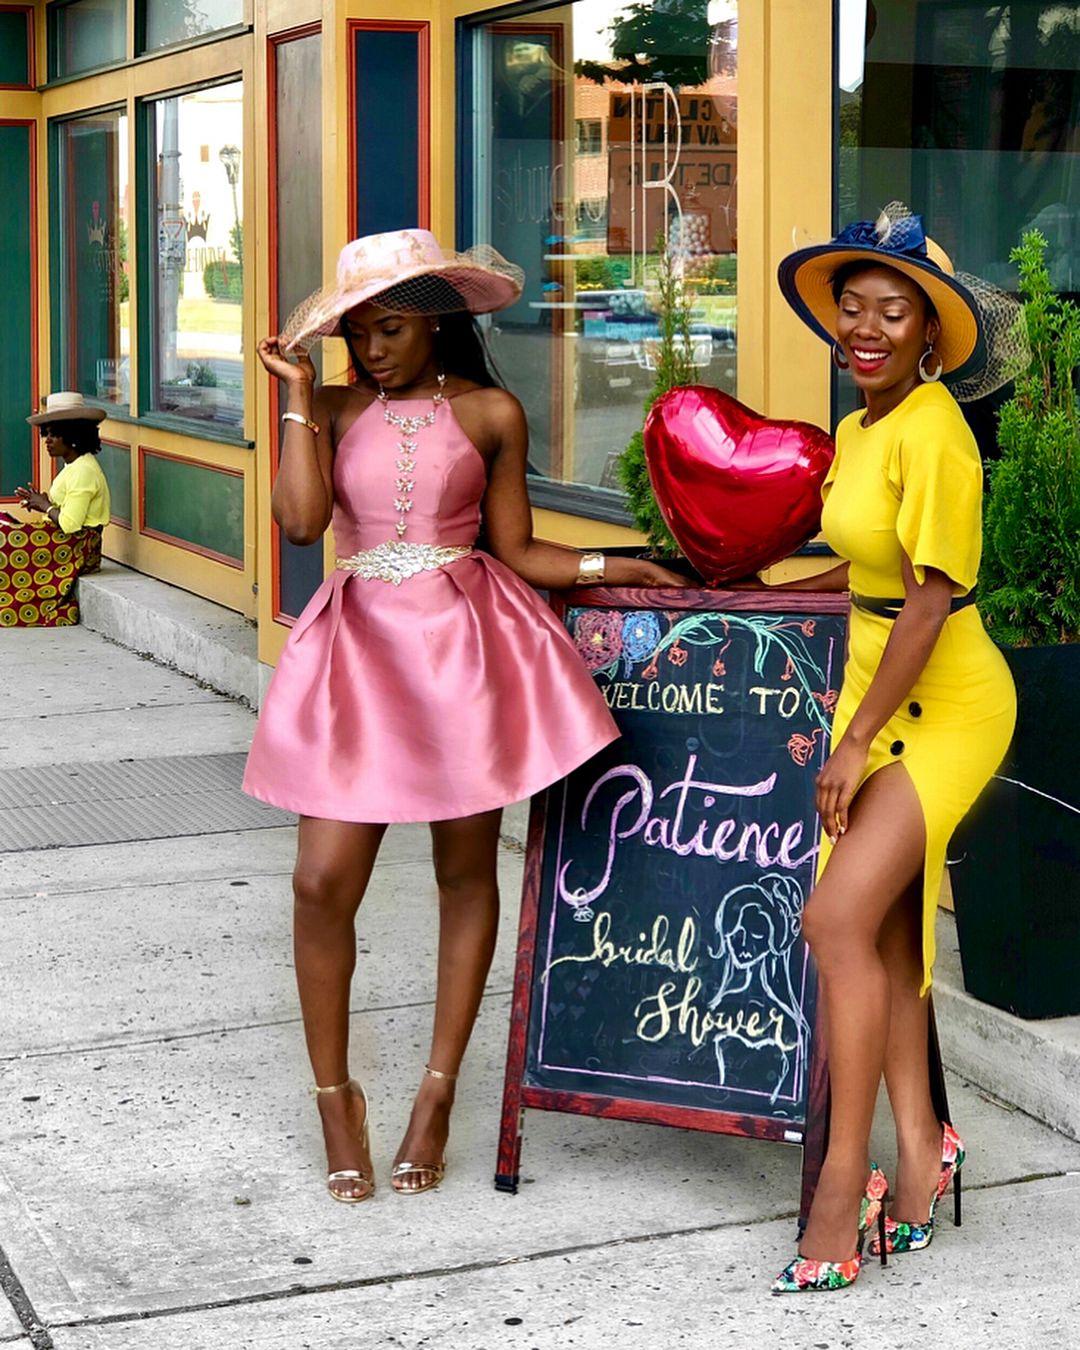 Liberian Girls Meetthecole2018 Patience S Bridal Tea Party Tea Party Attire Tea Party Outfits Tea Party Dress [ 1350 x 1080 Pixel ]